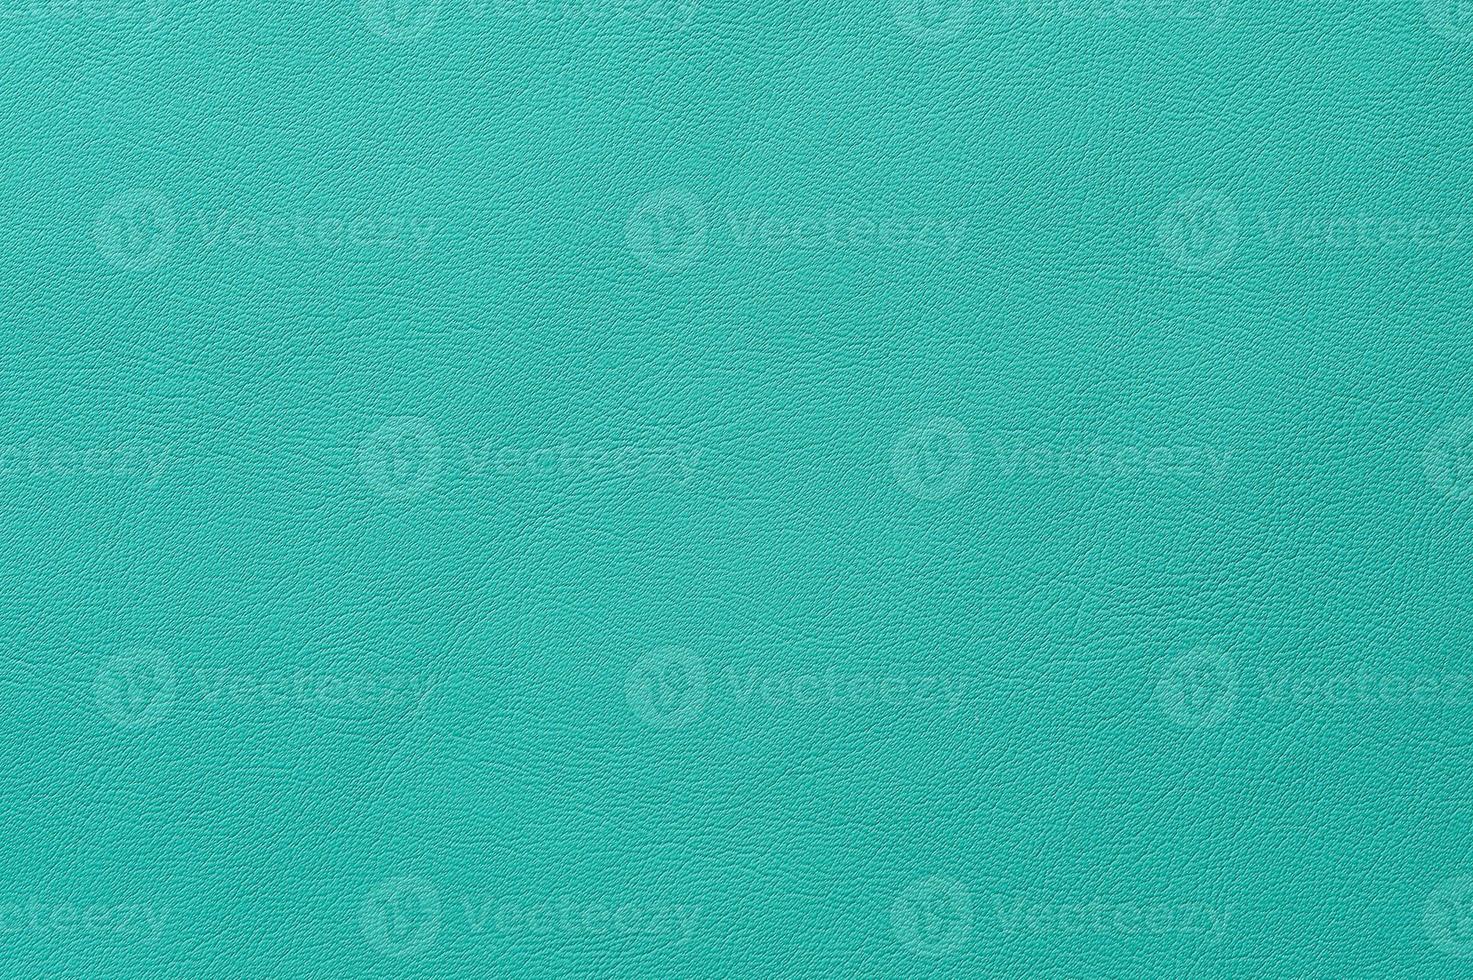 Nahaufnahme der nahtlosen grünen Lederstruktur foto